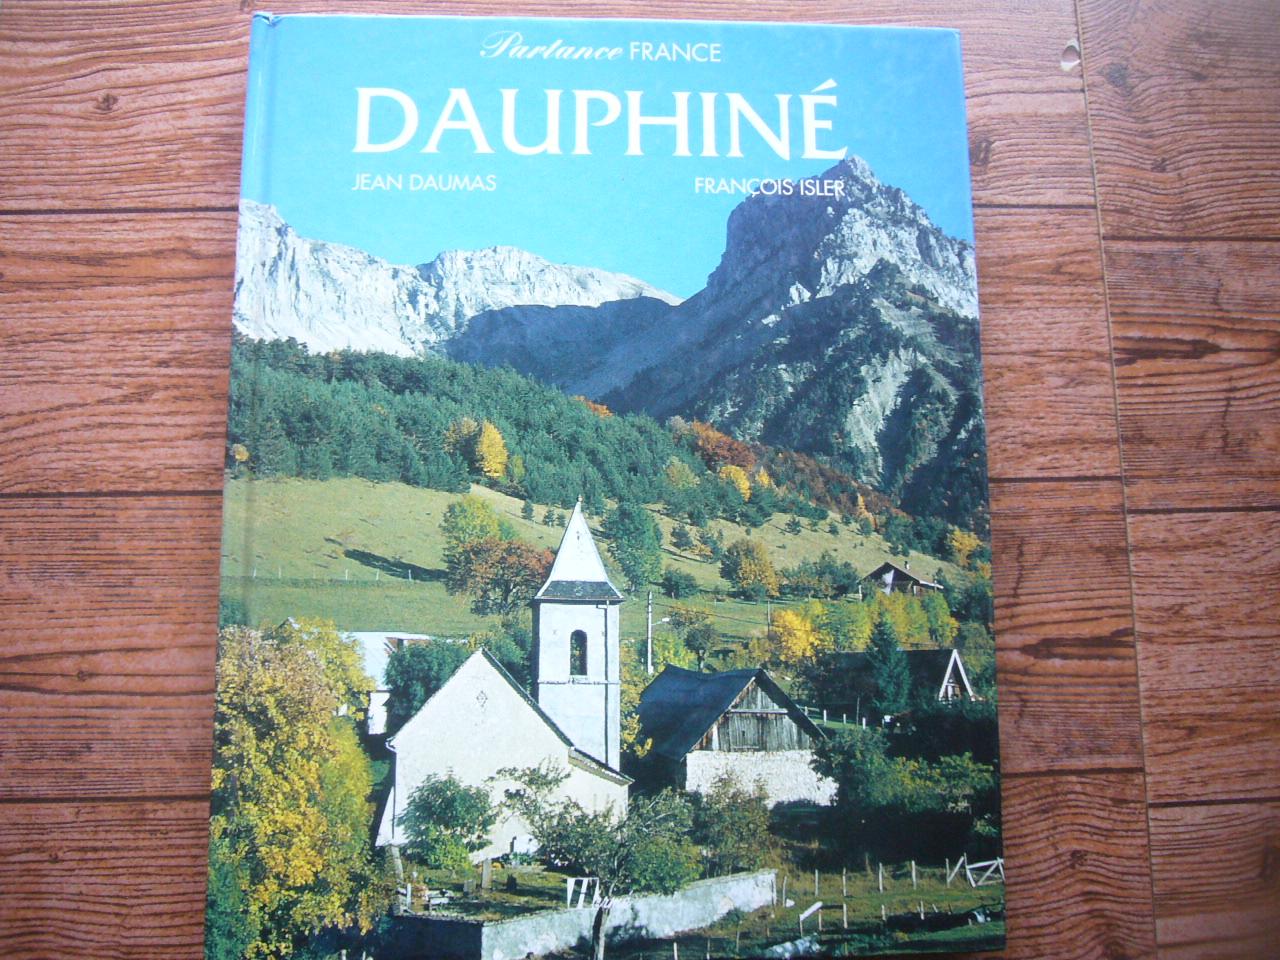 DAUPHINE (Partance France)